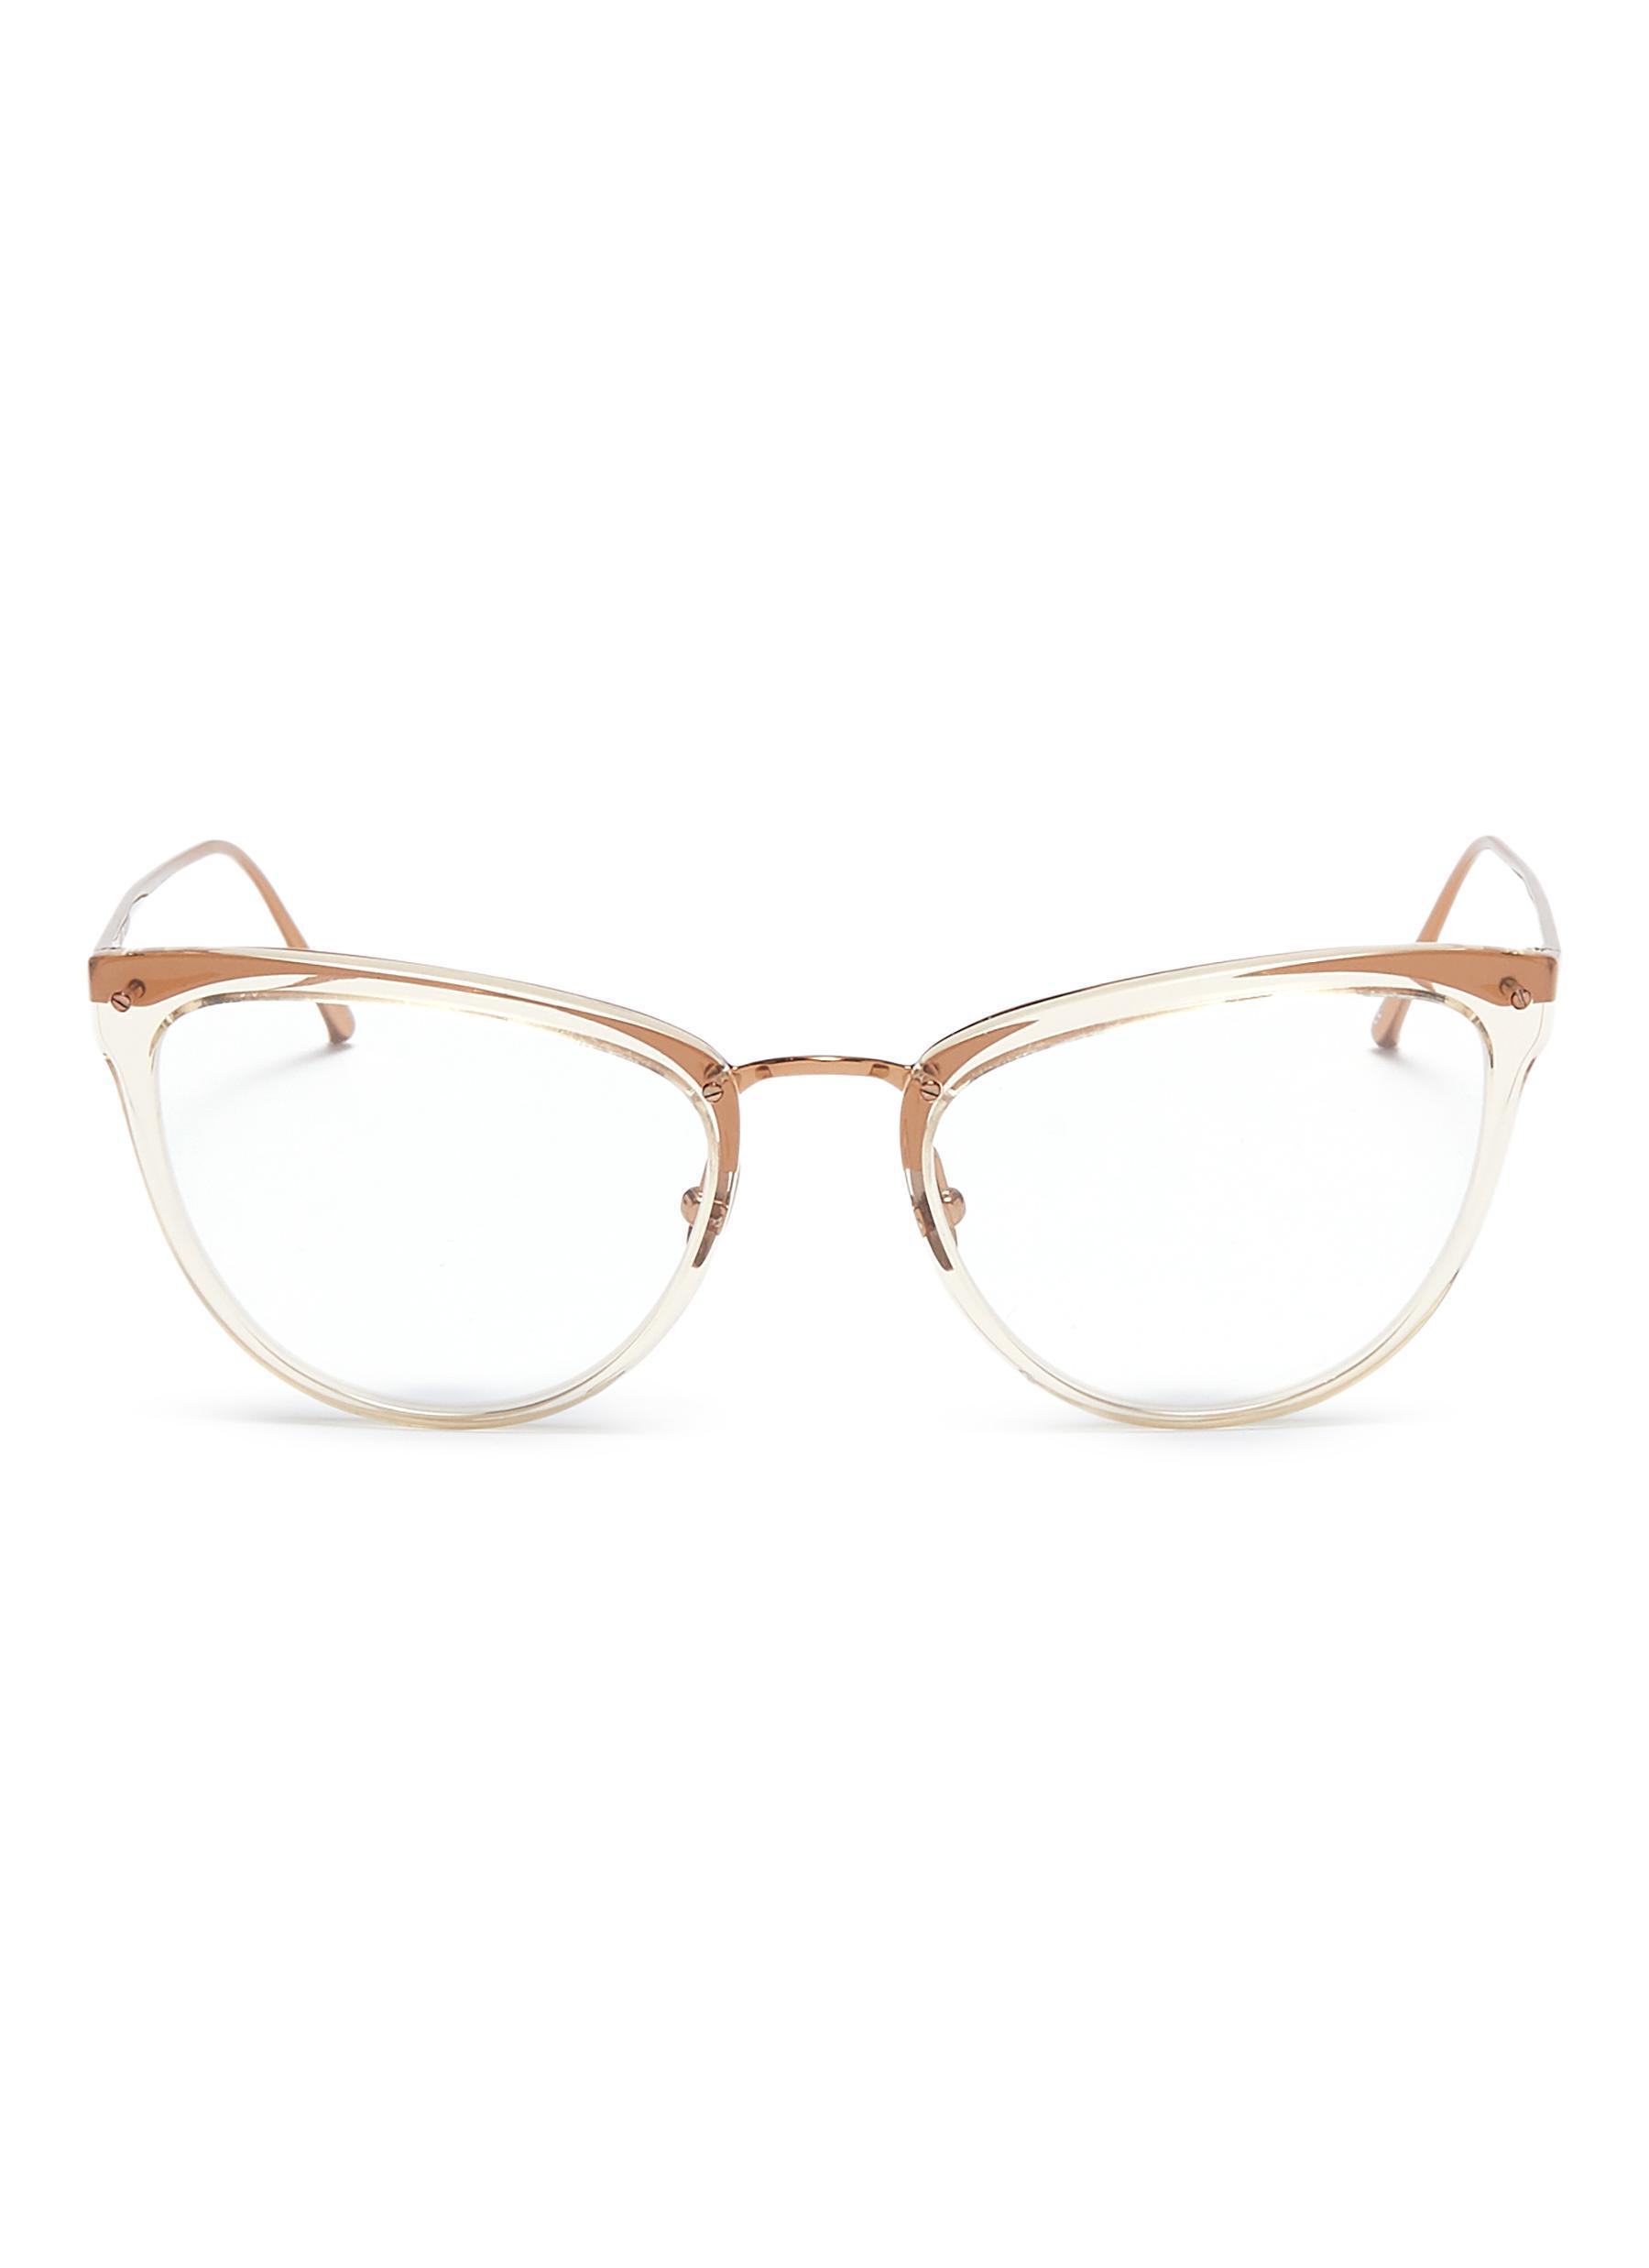 2292dce69ff Linda Farrow Acetate Front Metal Cat Eye Optical Glasses - Lyst